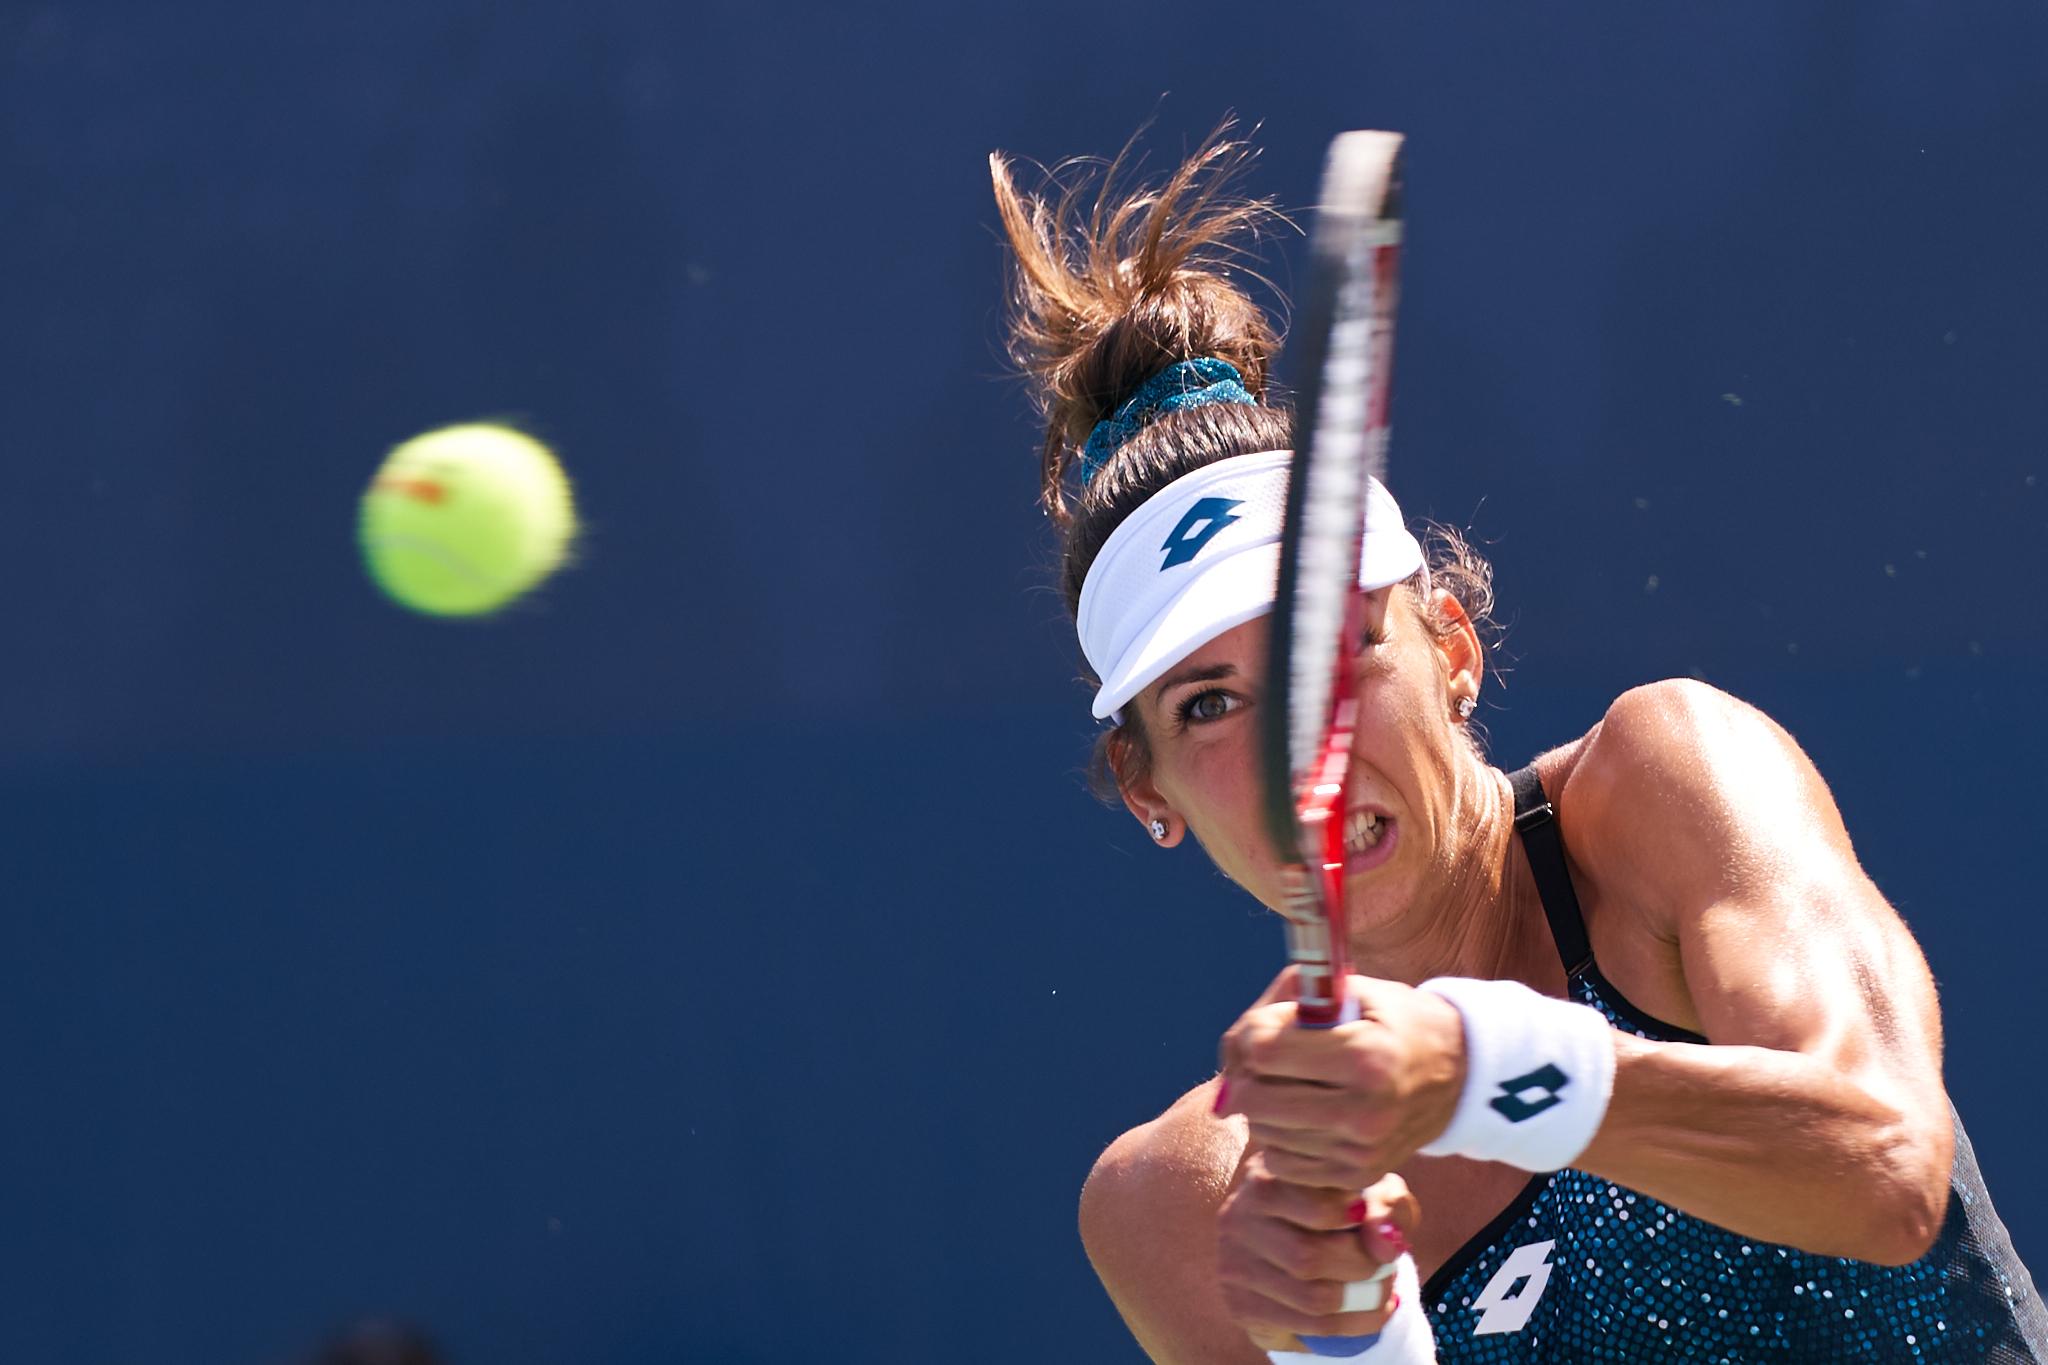 Aliona Bolsova, Court 9, Women's Singles Qualifying Round 4  Sony A9, Sony 70-200mm f2.8 GM-OSS